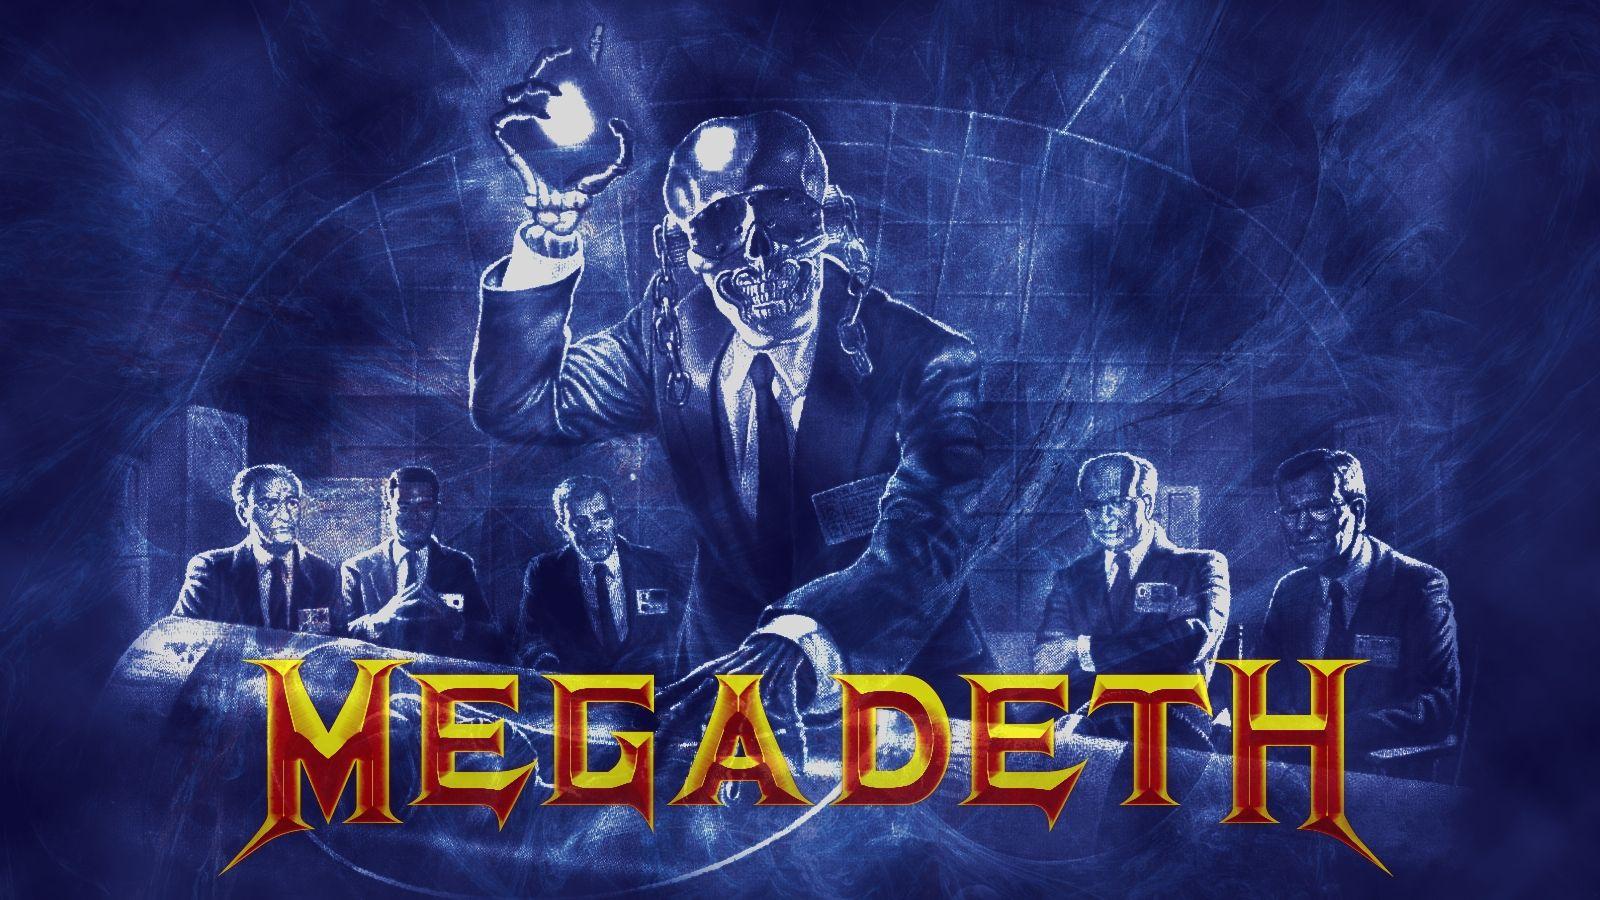 Megadeth Wallpaper Desktop Rust In Peace Metal Music Bands Art